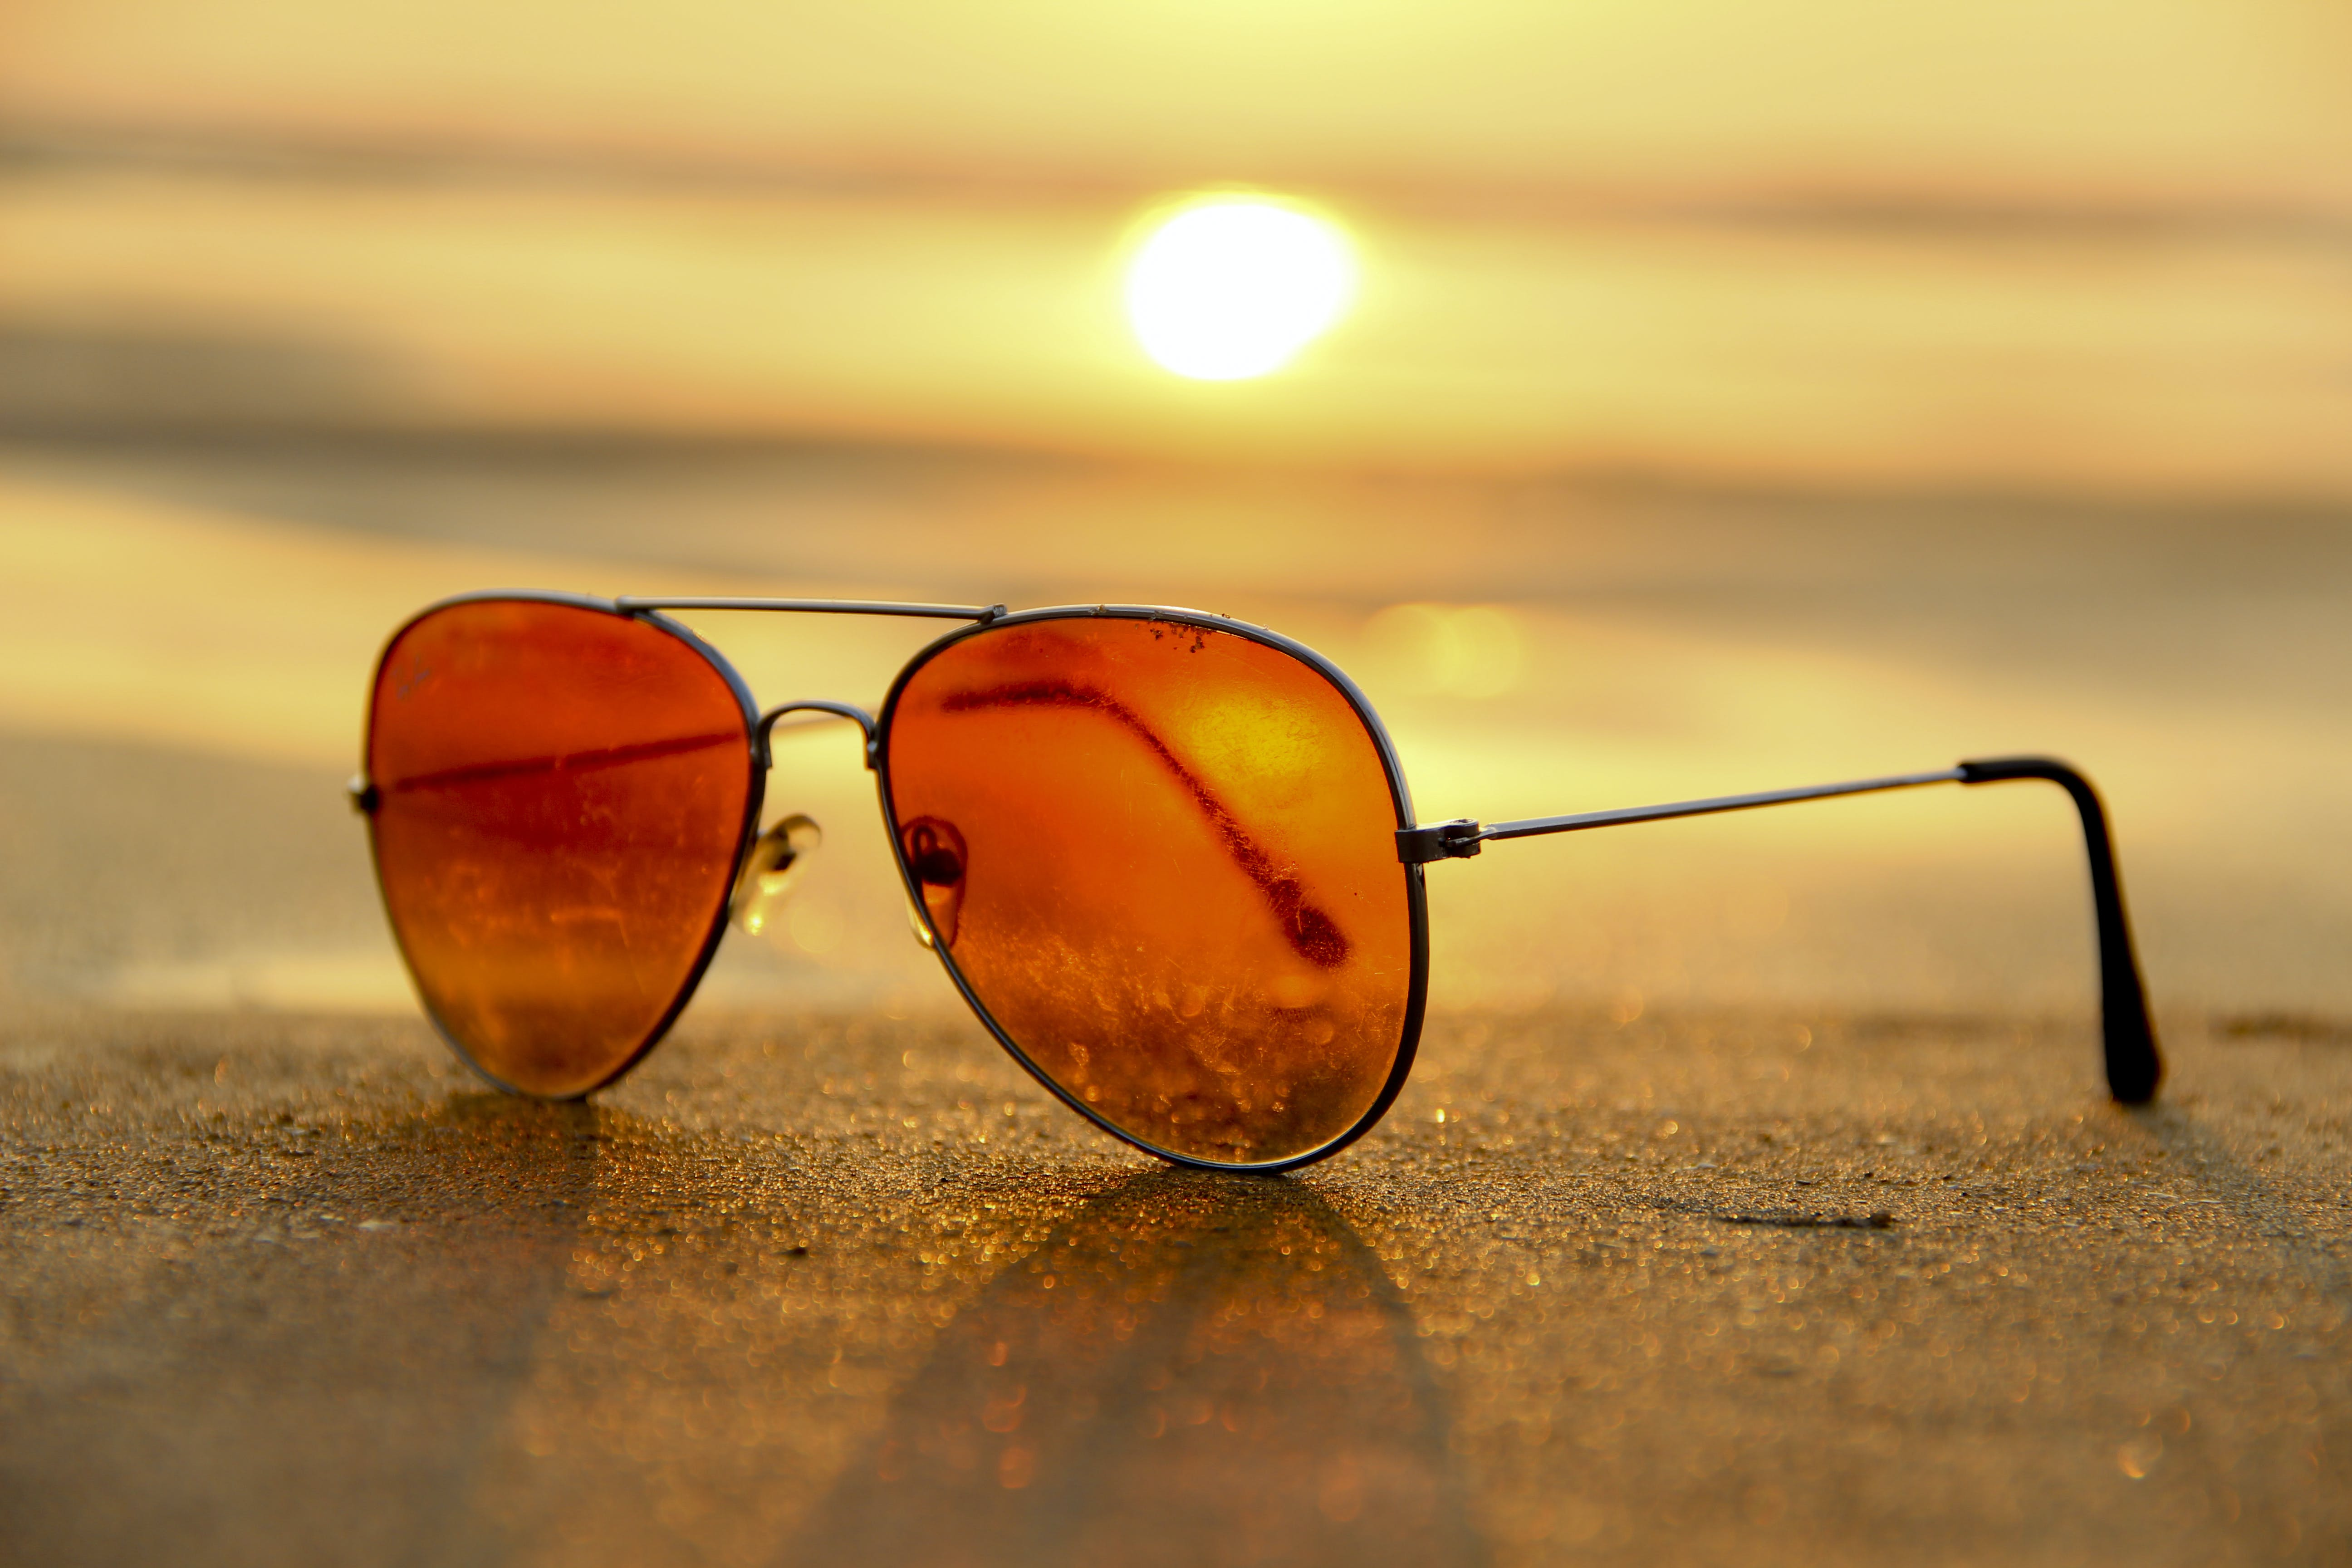 léto, písek, pláž